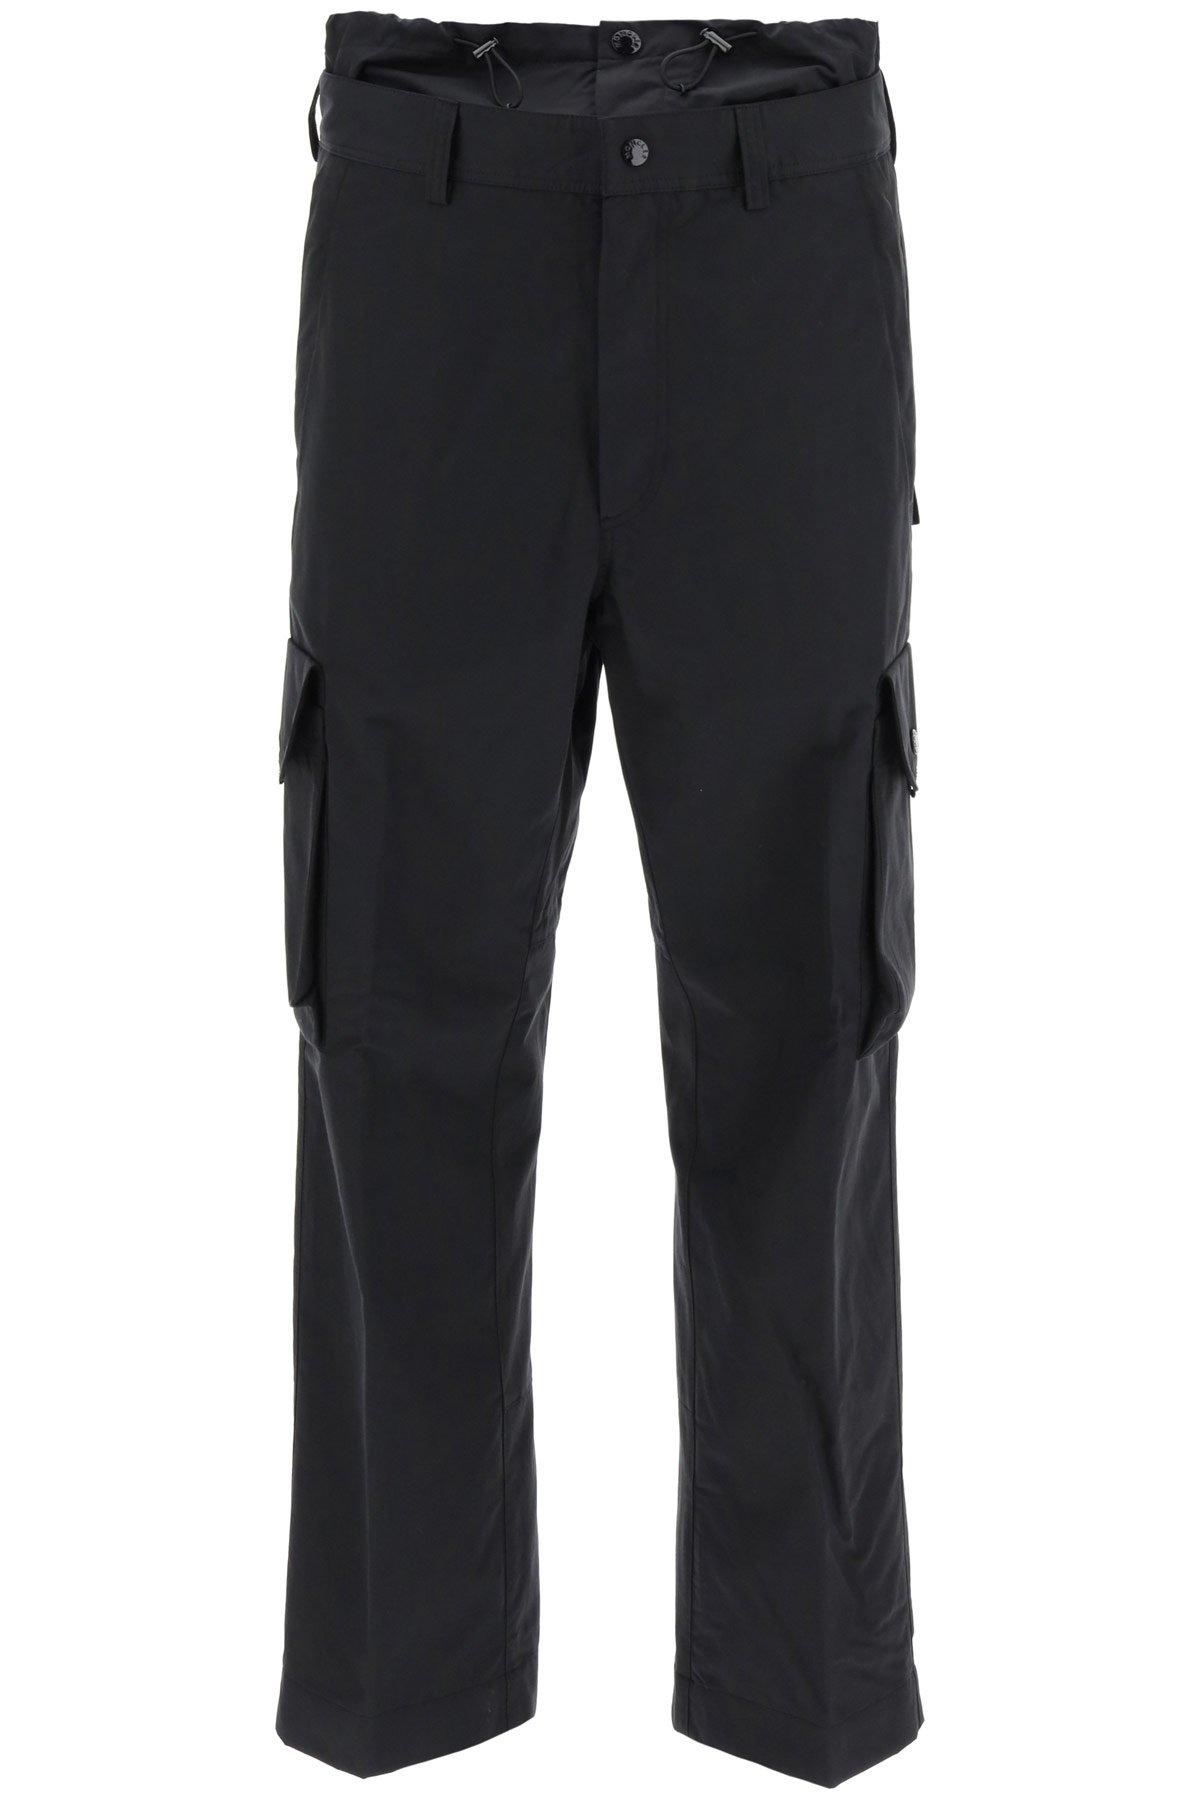 Moncler x jwanderson pantaloni cargo moncler genius 1